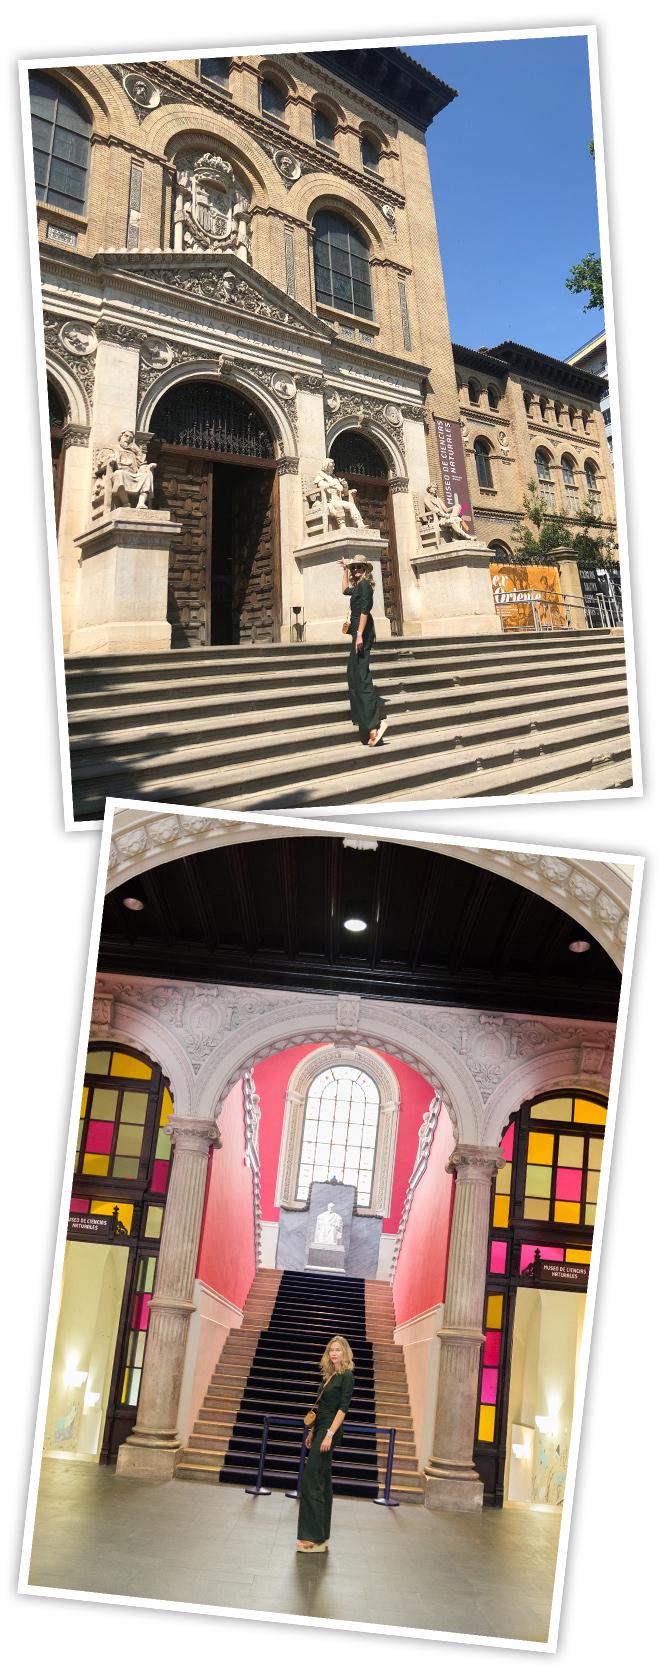 Paraninfo de la Universidad de Zaragoza